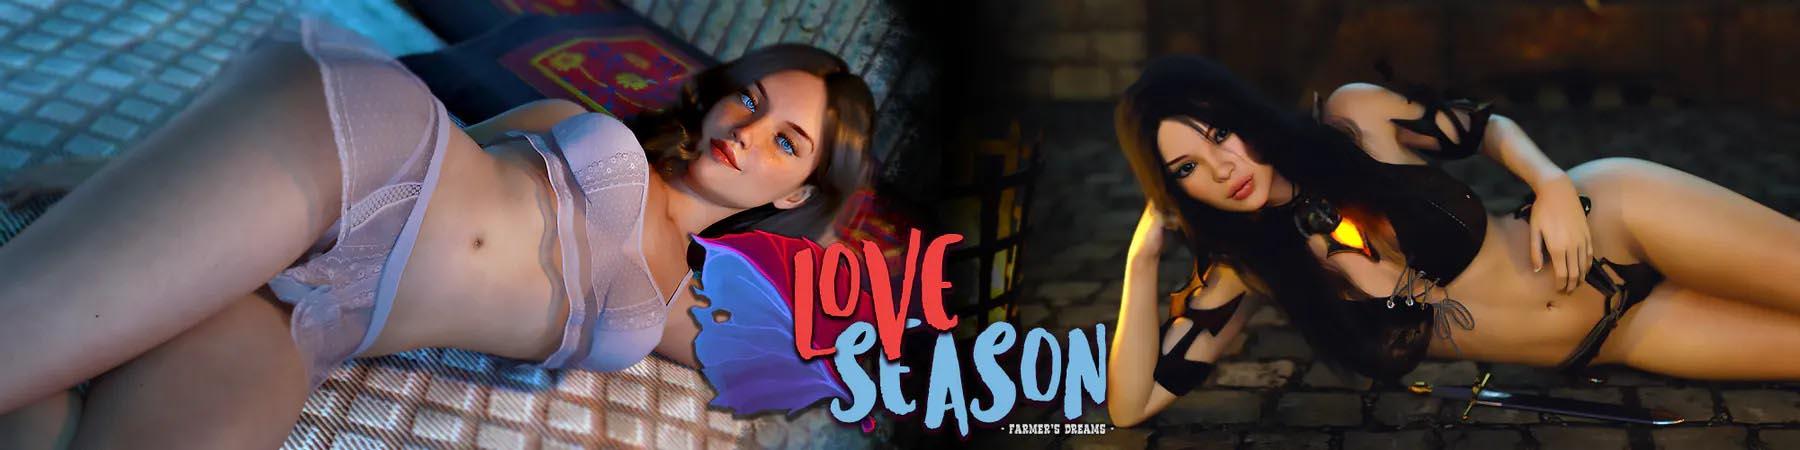 Love Season Farmer's Dreams - 3D Adult Games